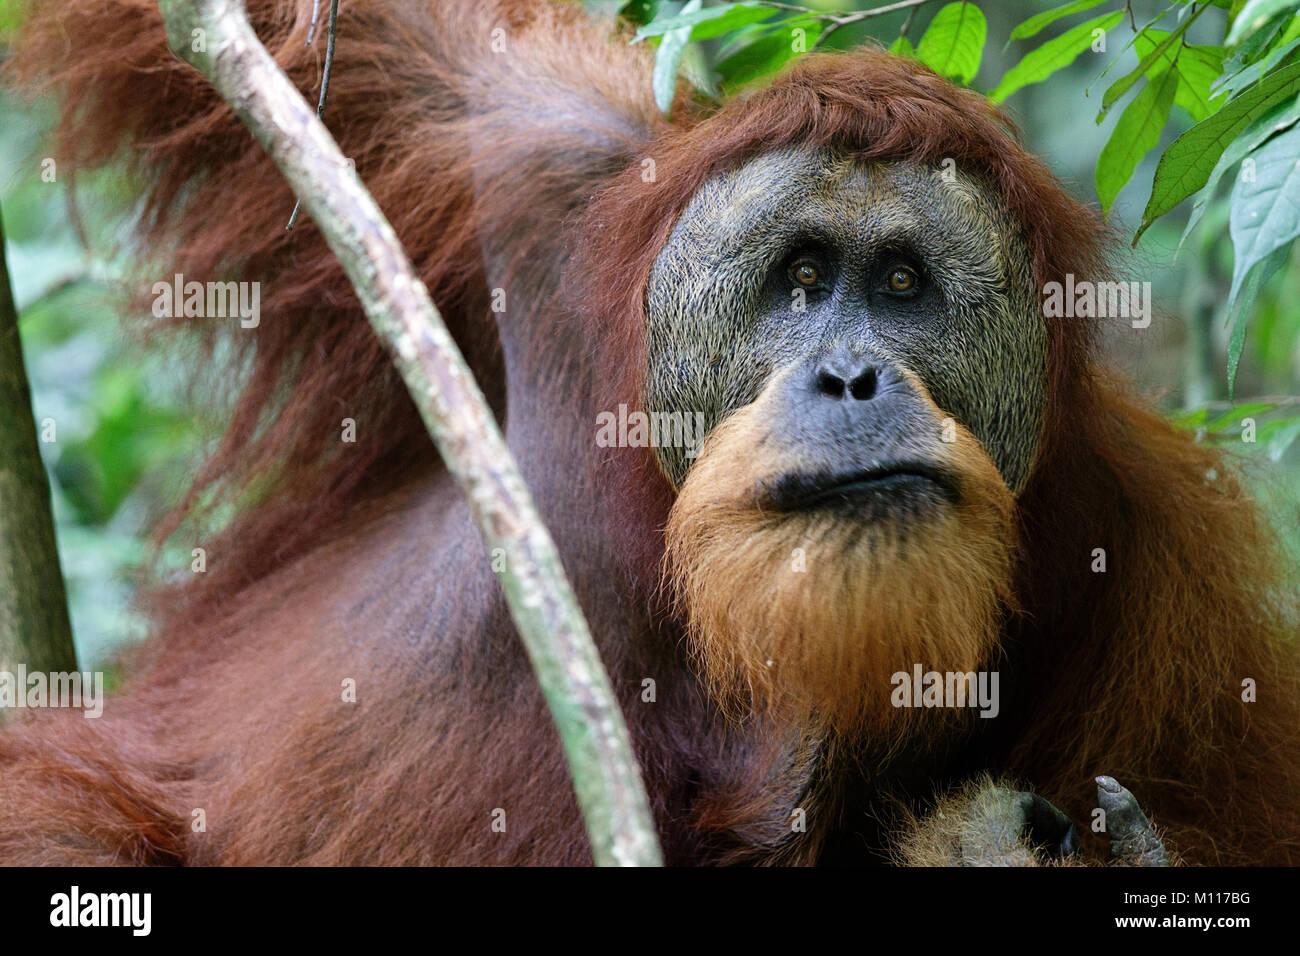 Sumatran orangutan (Pongo abelii) mature male. Gunung Leuser National Park Sumatra Indonesia. Stock Photo